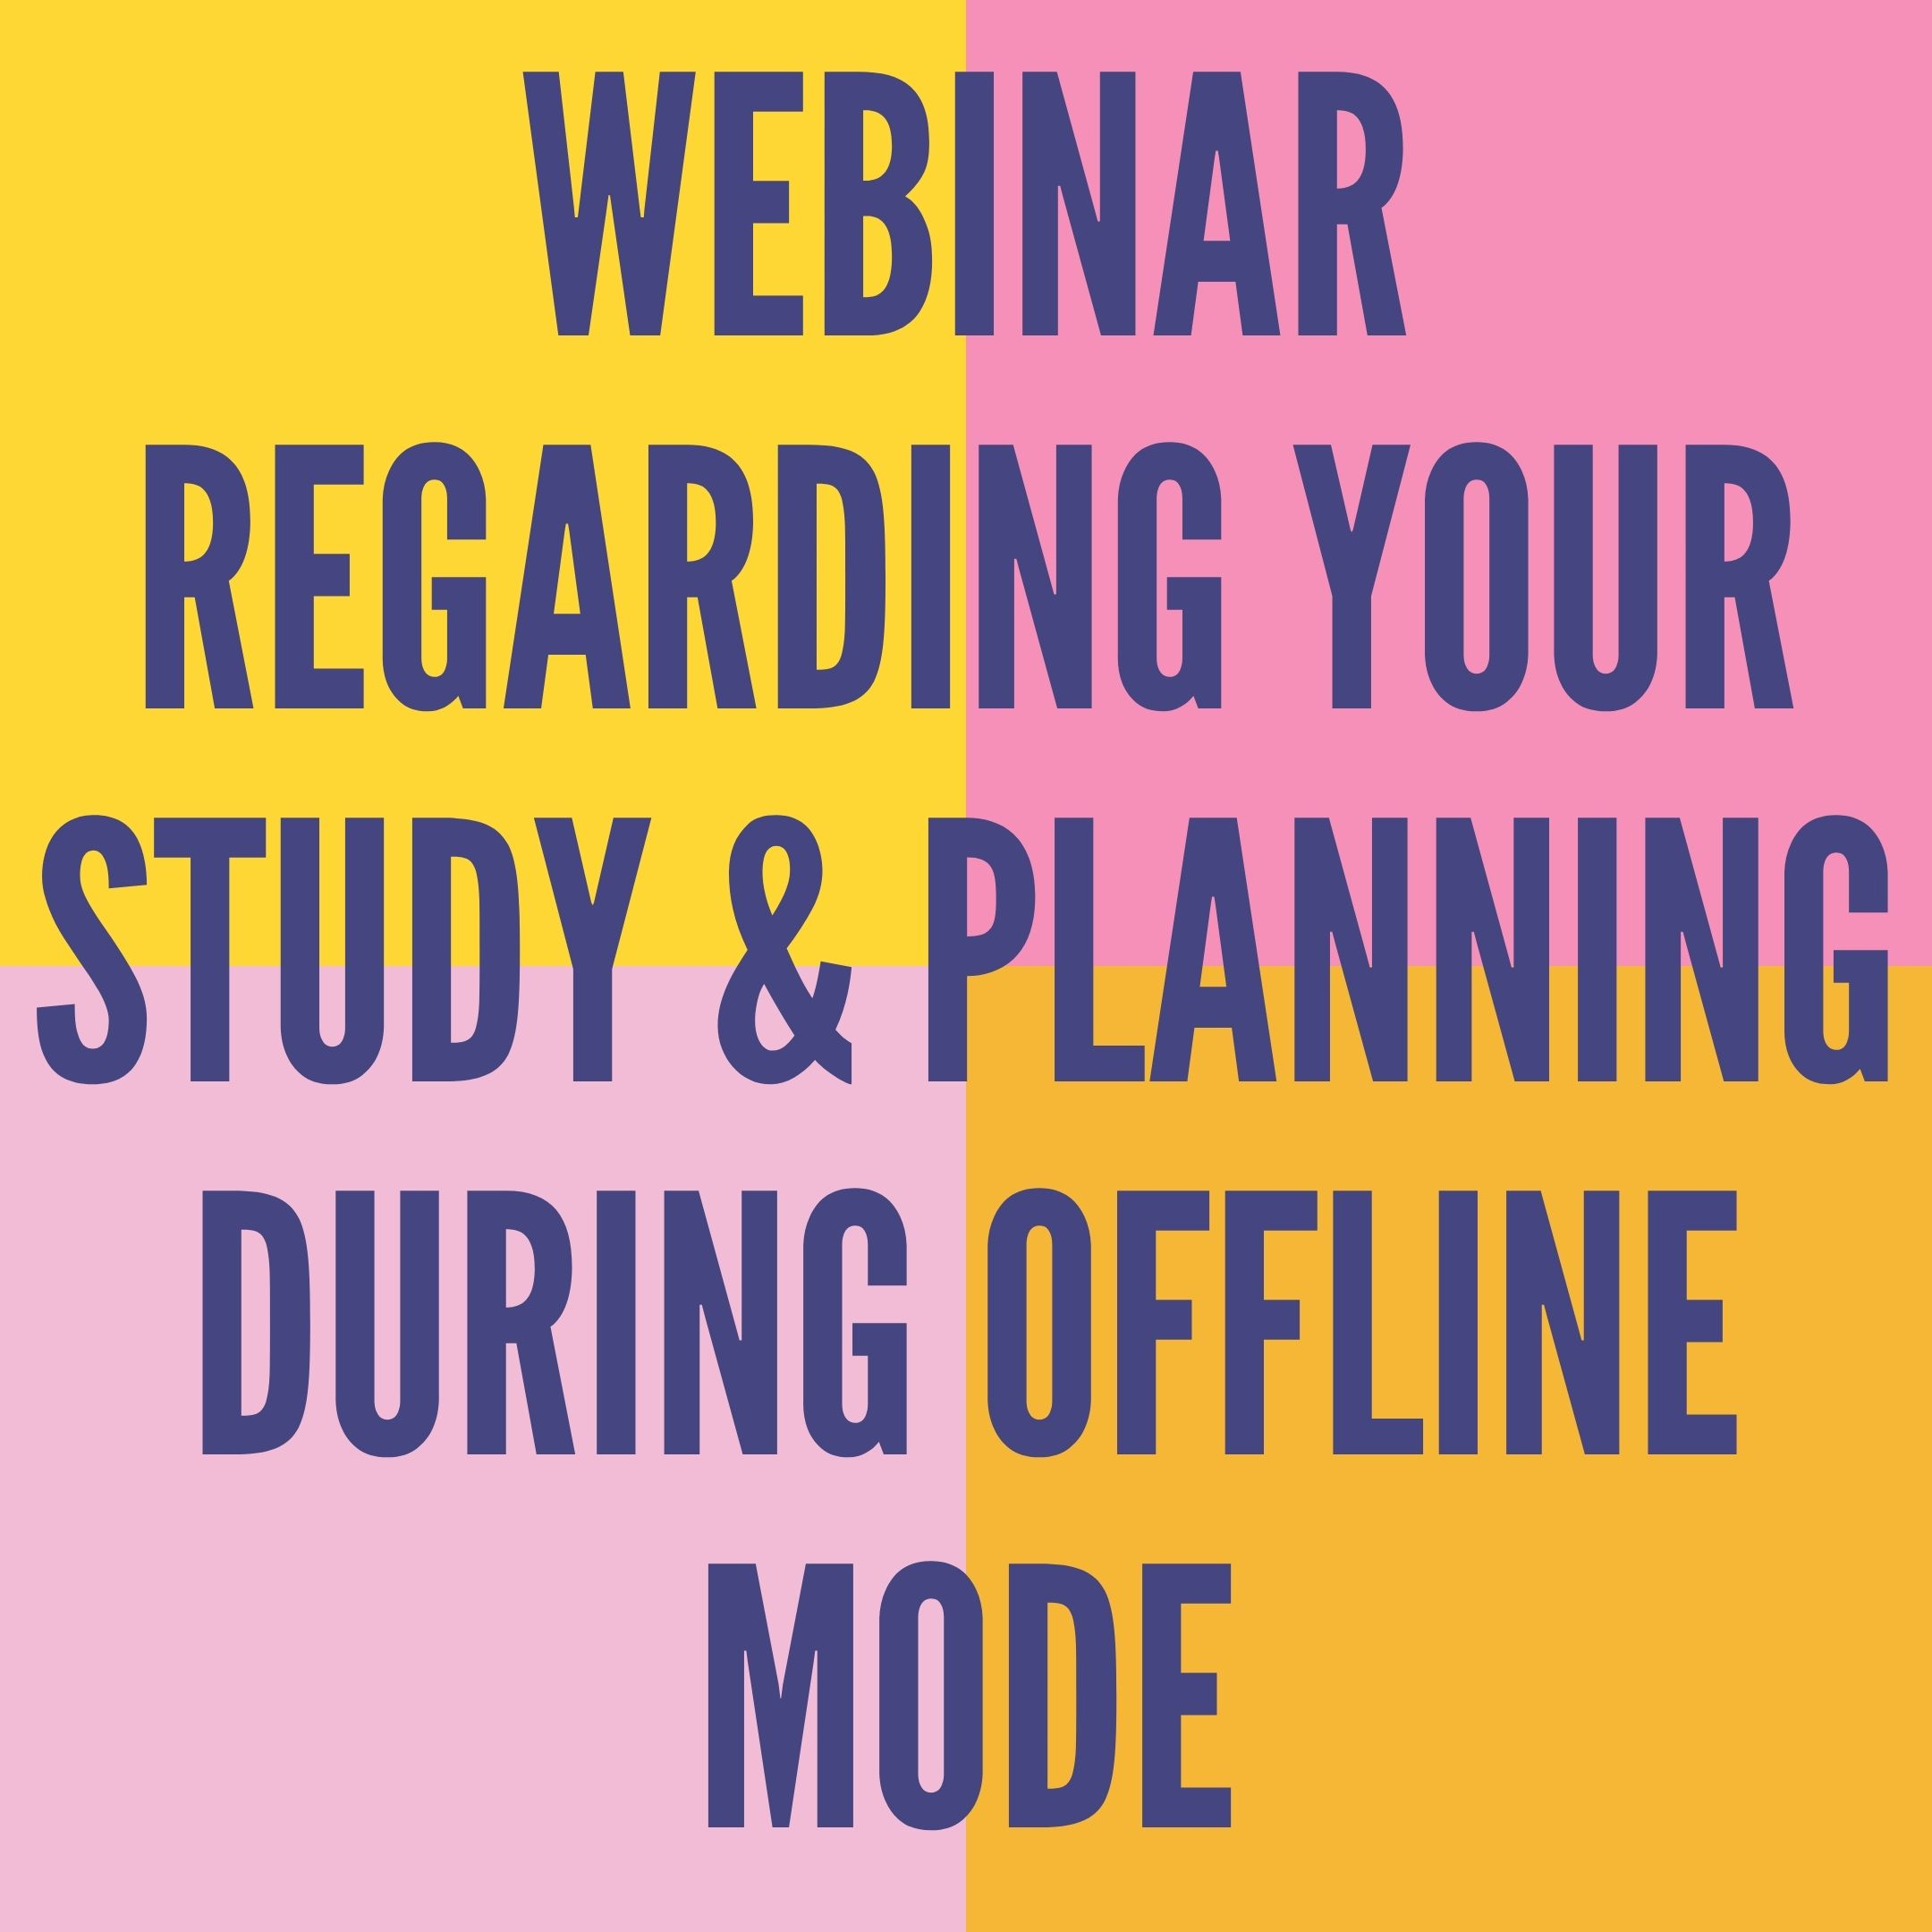 WEBINAR REGARDING YOUR STUDY & PLANNING DURING OFFLINE MODE